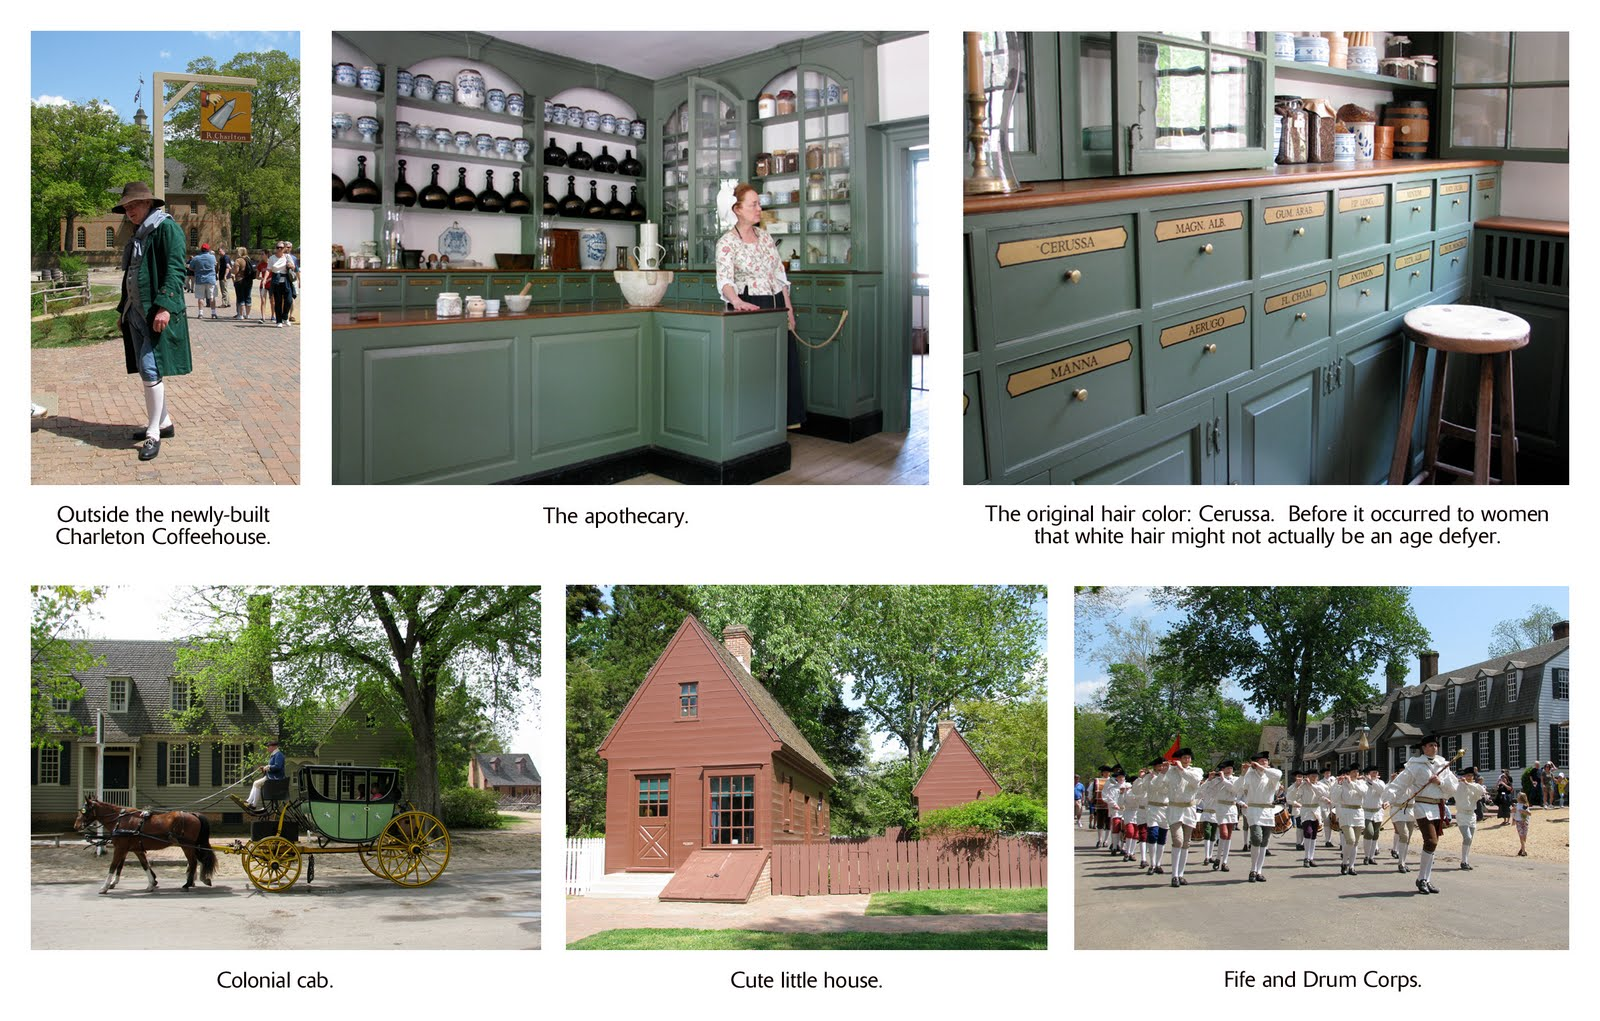 The Village Carpenter: Scenes from Colonial Williamsburg